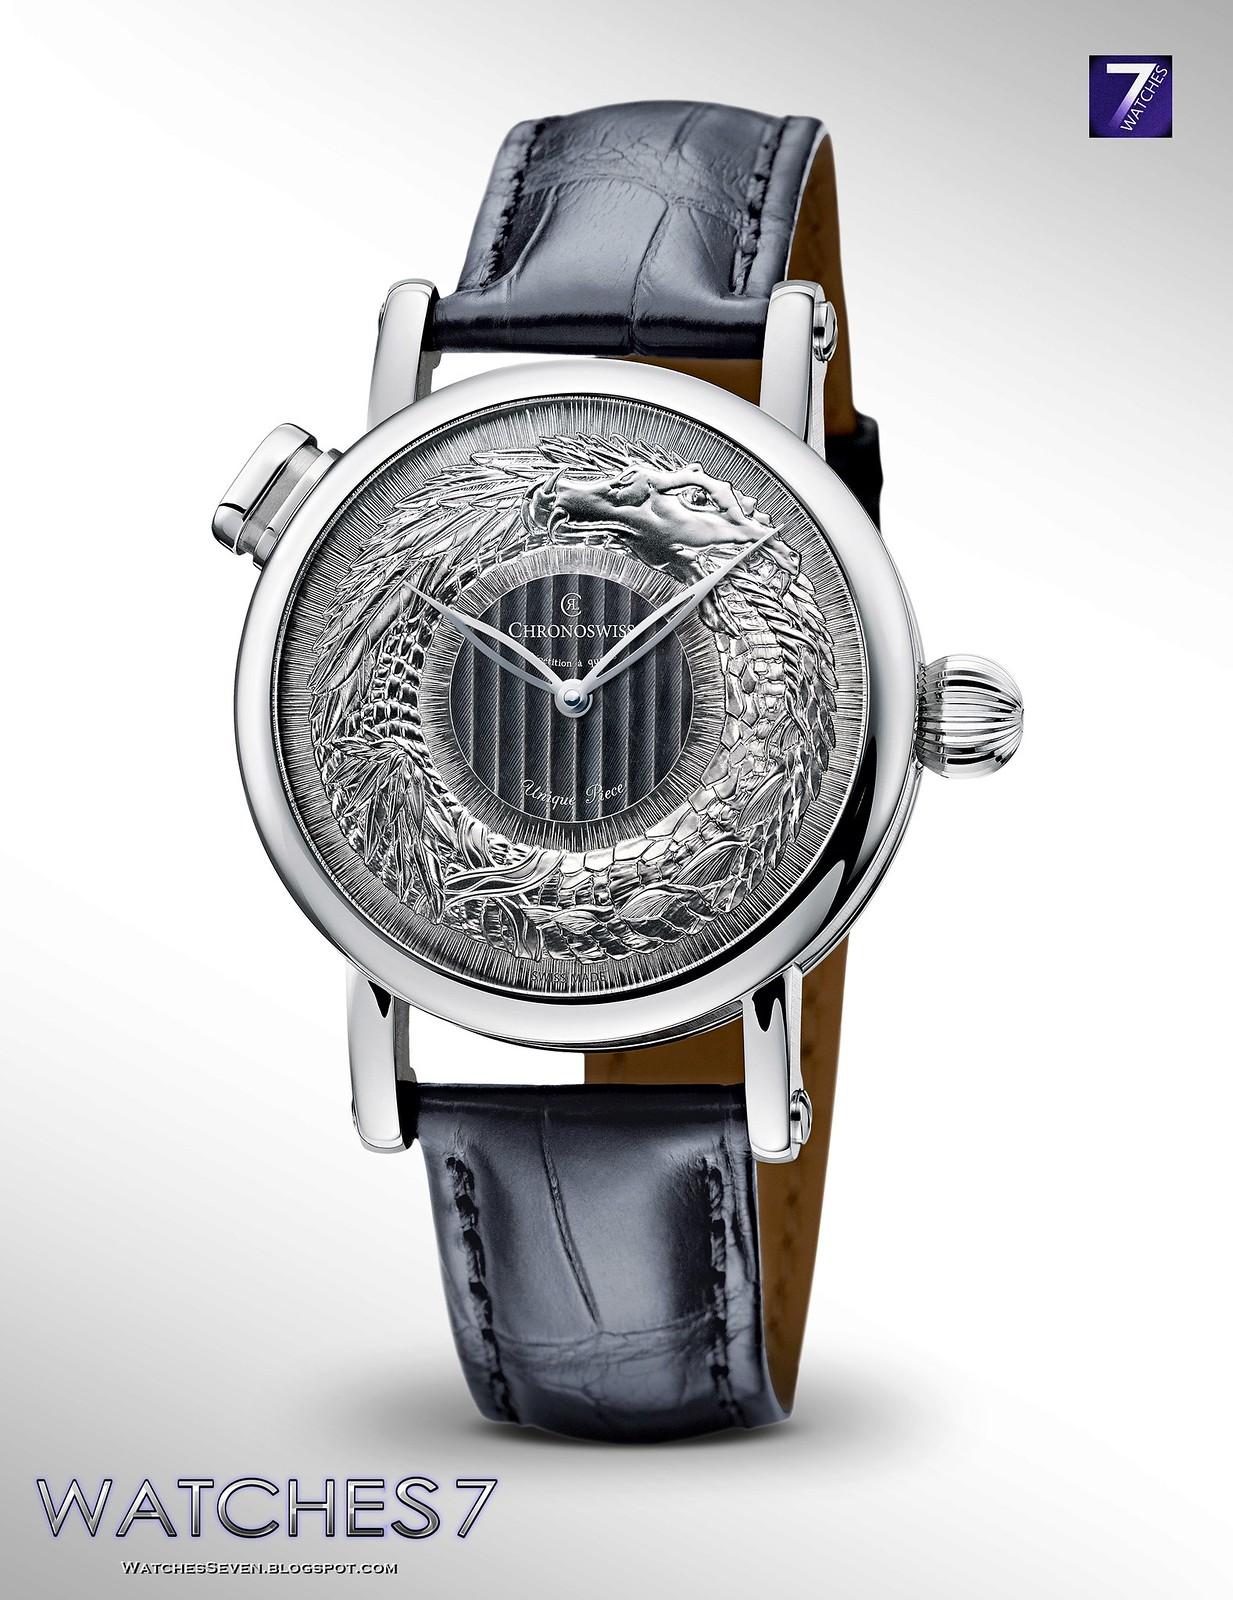 la chaux de fonds big and beautiful singles Breitling laederich, la chaux-de-fonds enameled gold dial: enameled gold, with a single gilded this big, beautiful and blazing antique diamond.